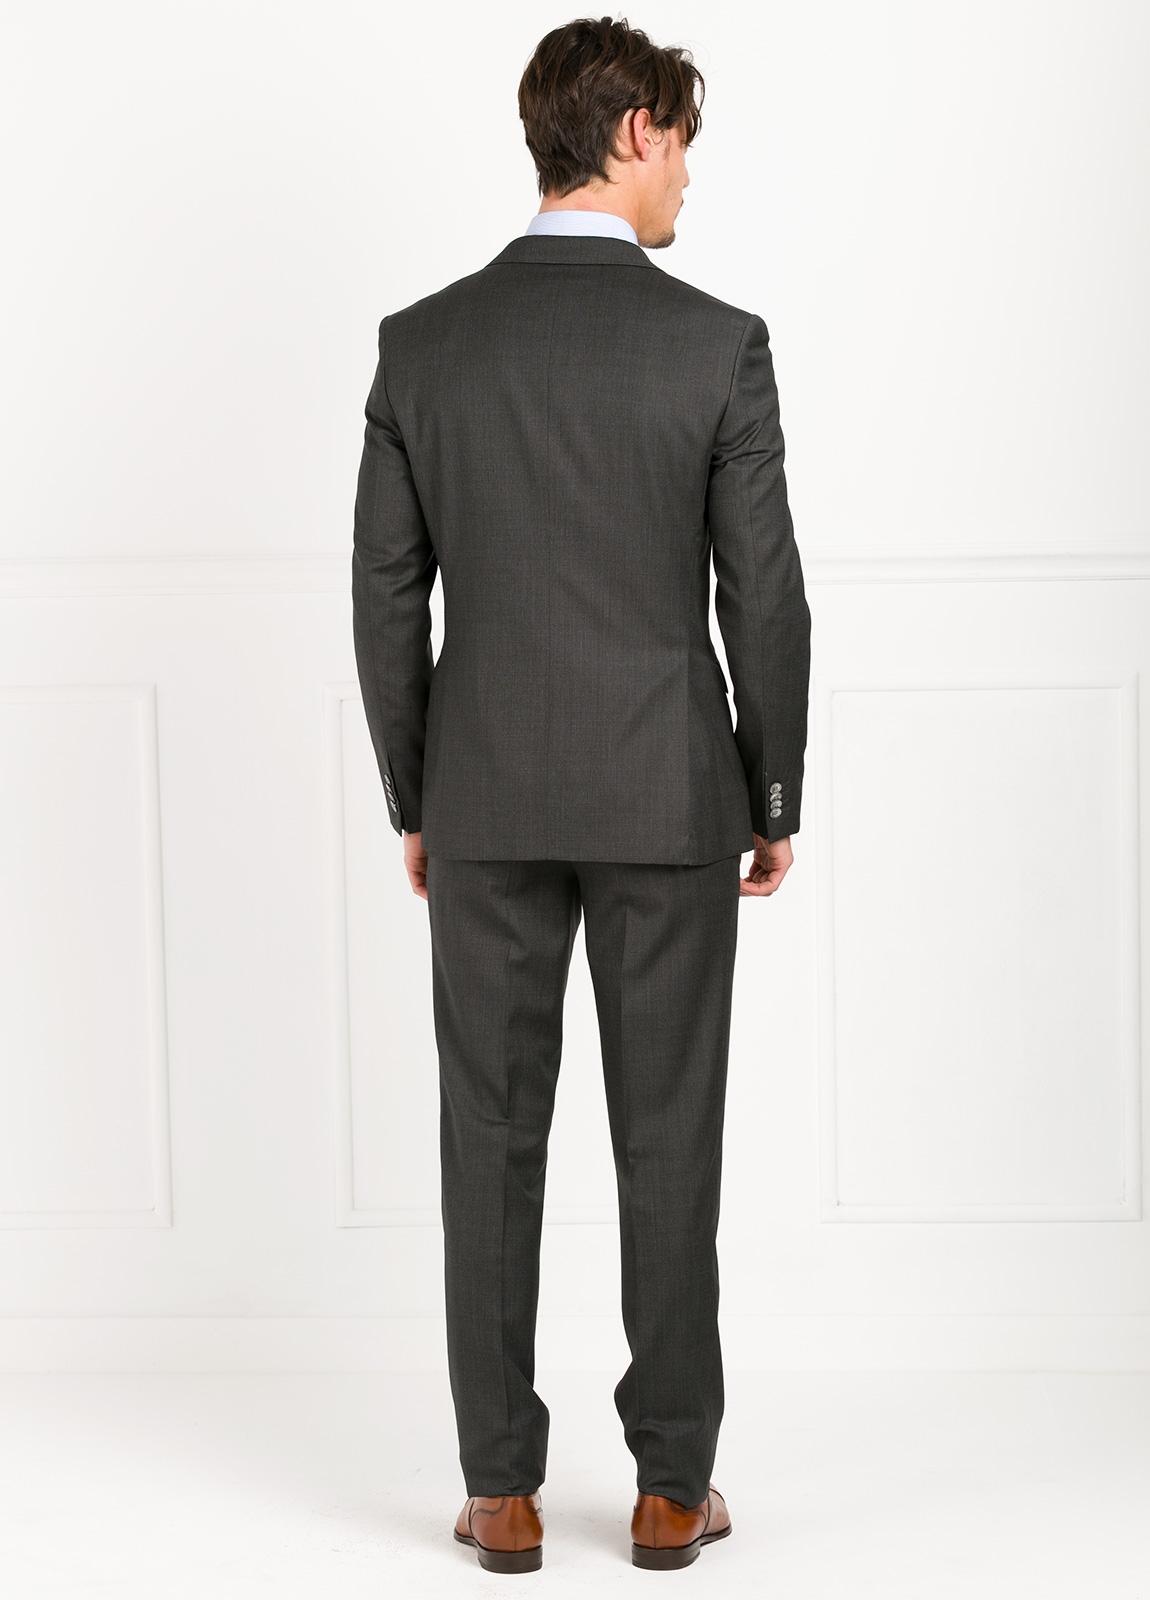 Traje liso SLIM FIT, tejido GUABELLO color gris marengo, 100% Lana. - Ítem3